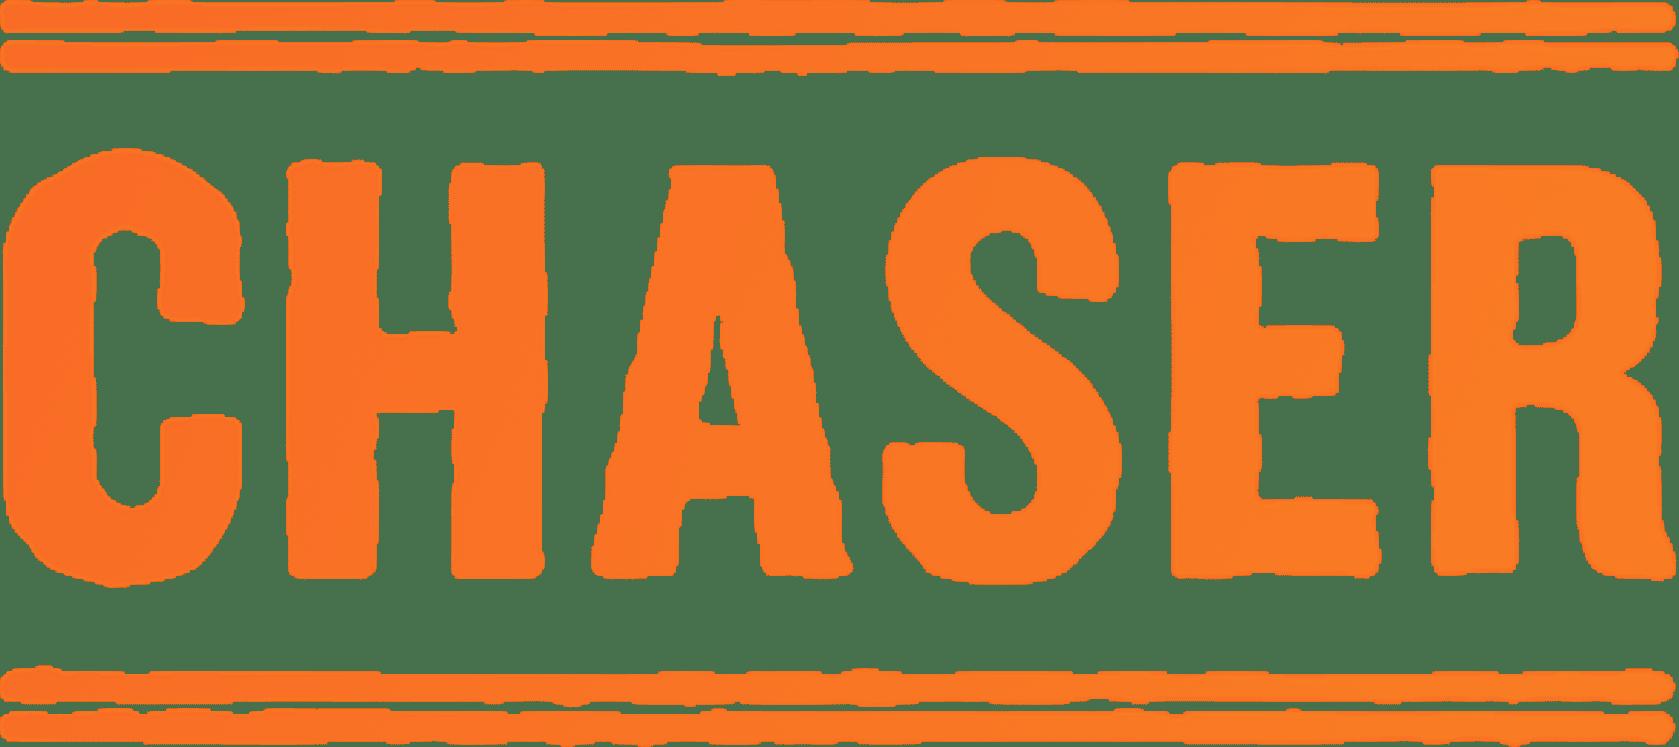 chaser stamp logo orange